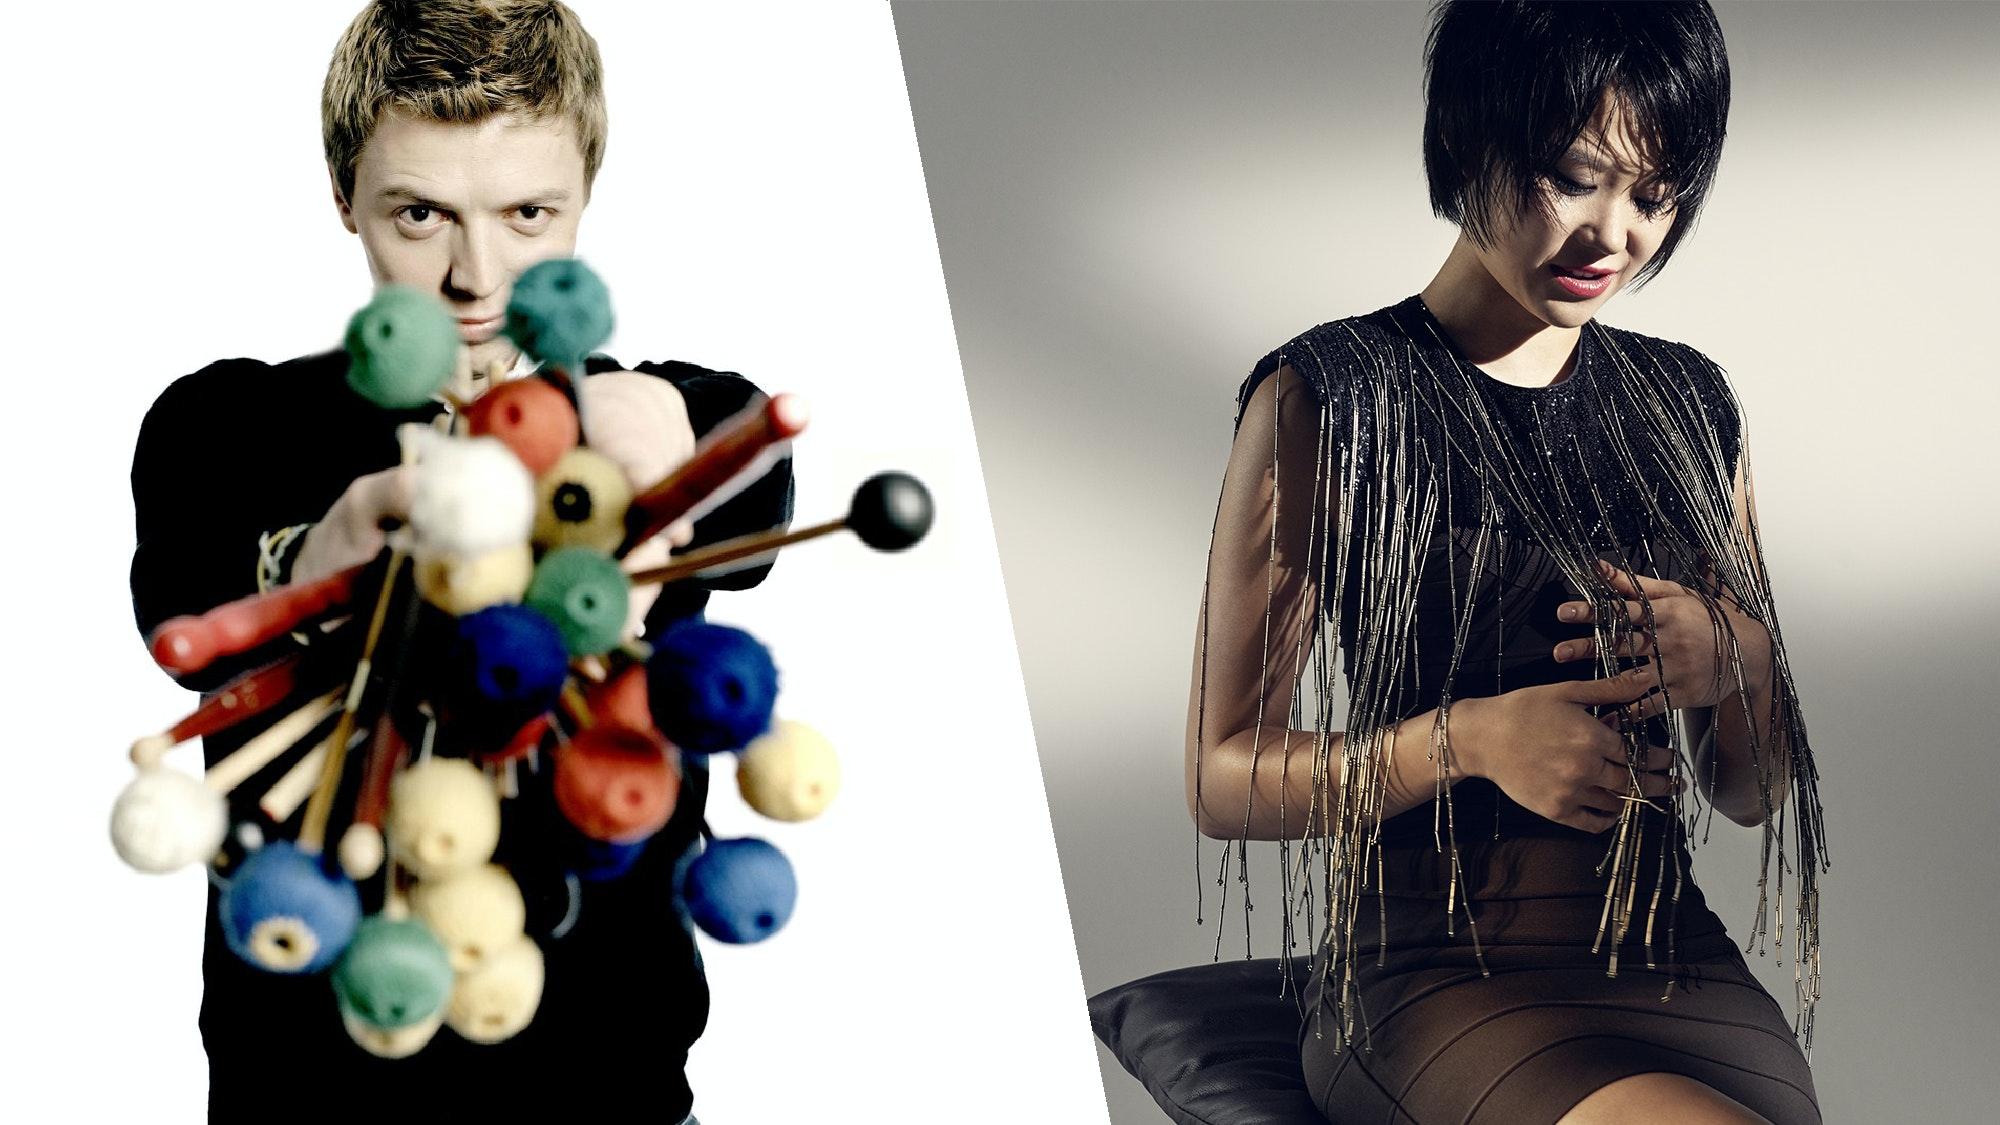 Yuja Wang and Martin Grubinger: An Explosive Encounter Between Piano and Percussion